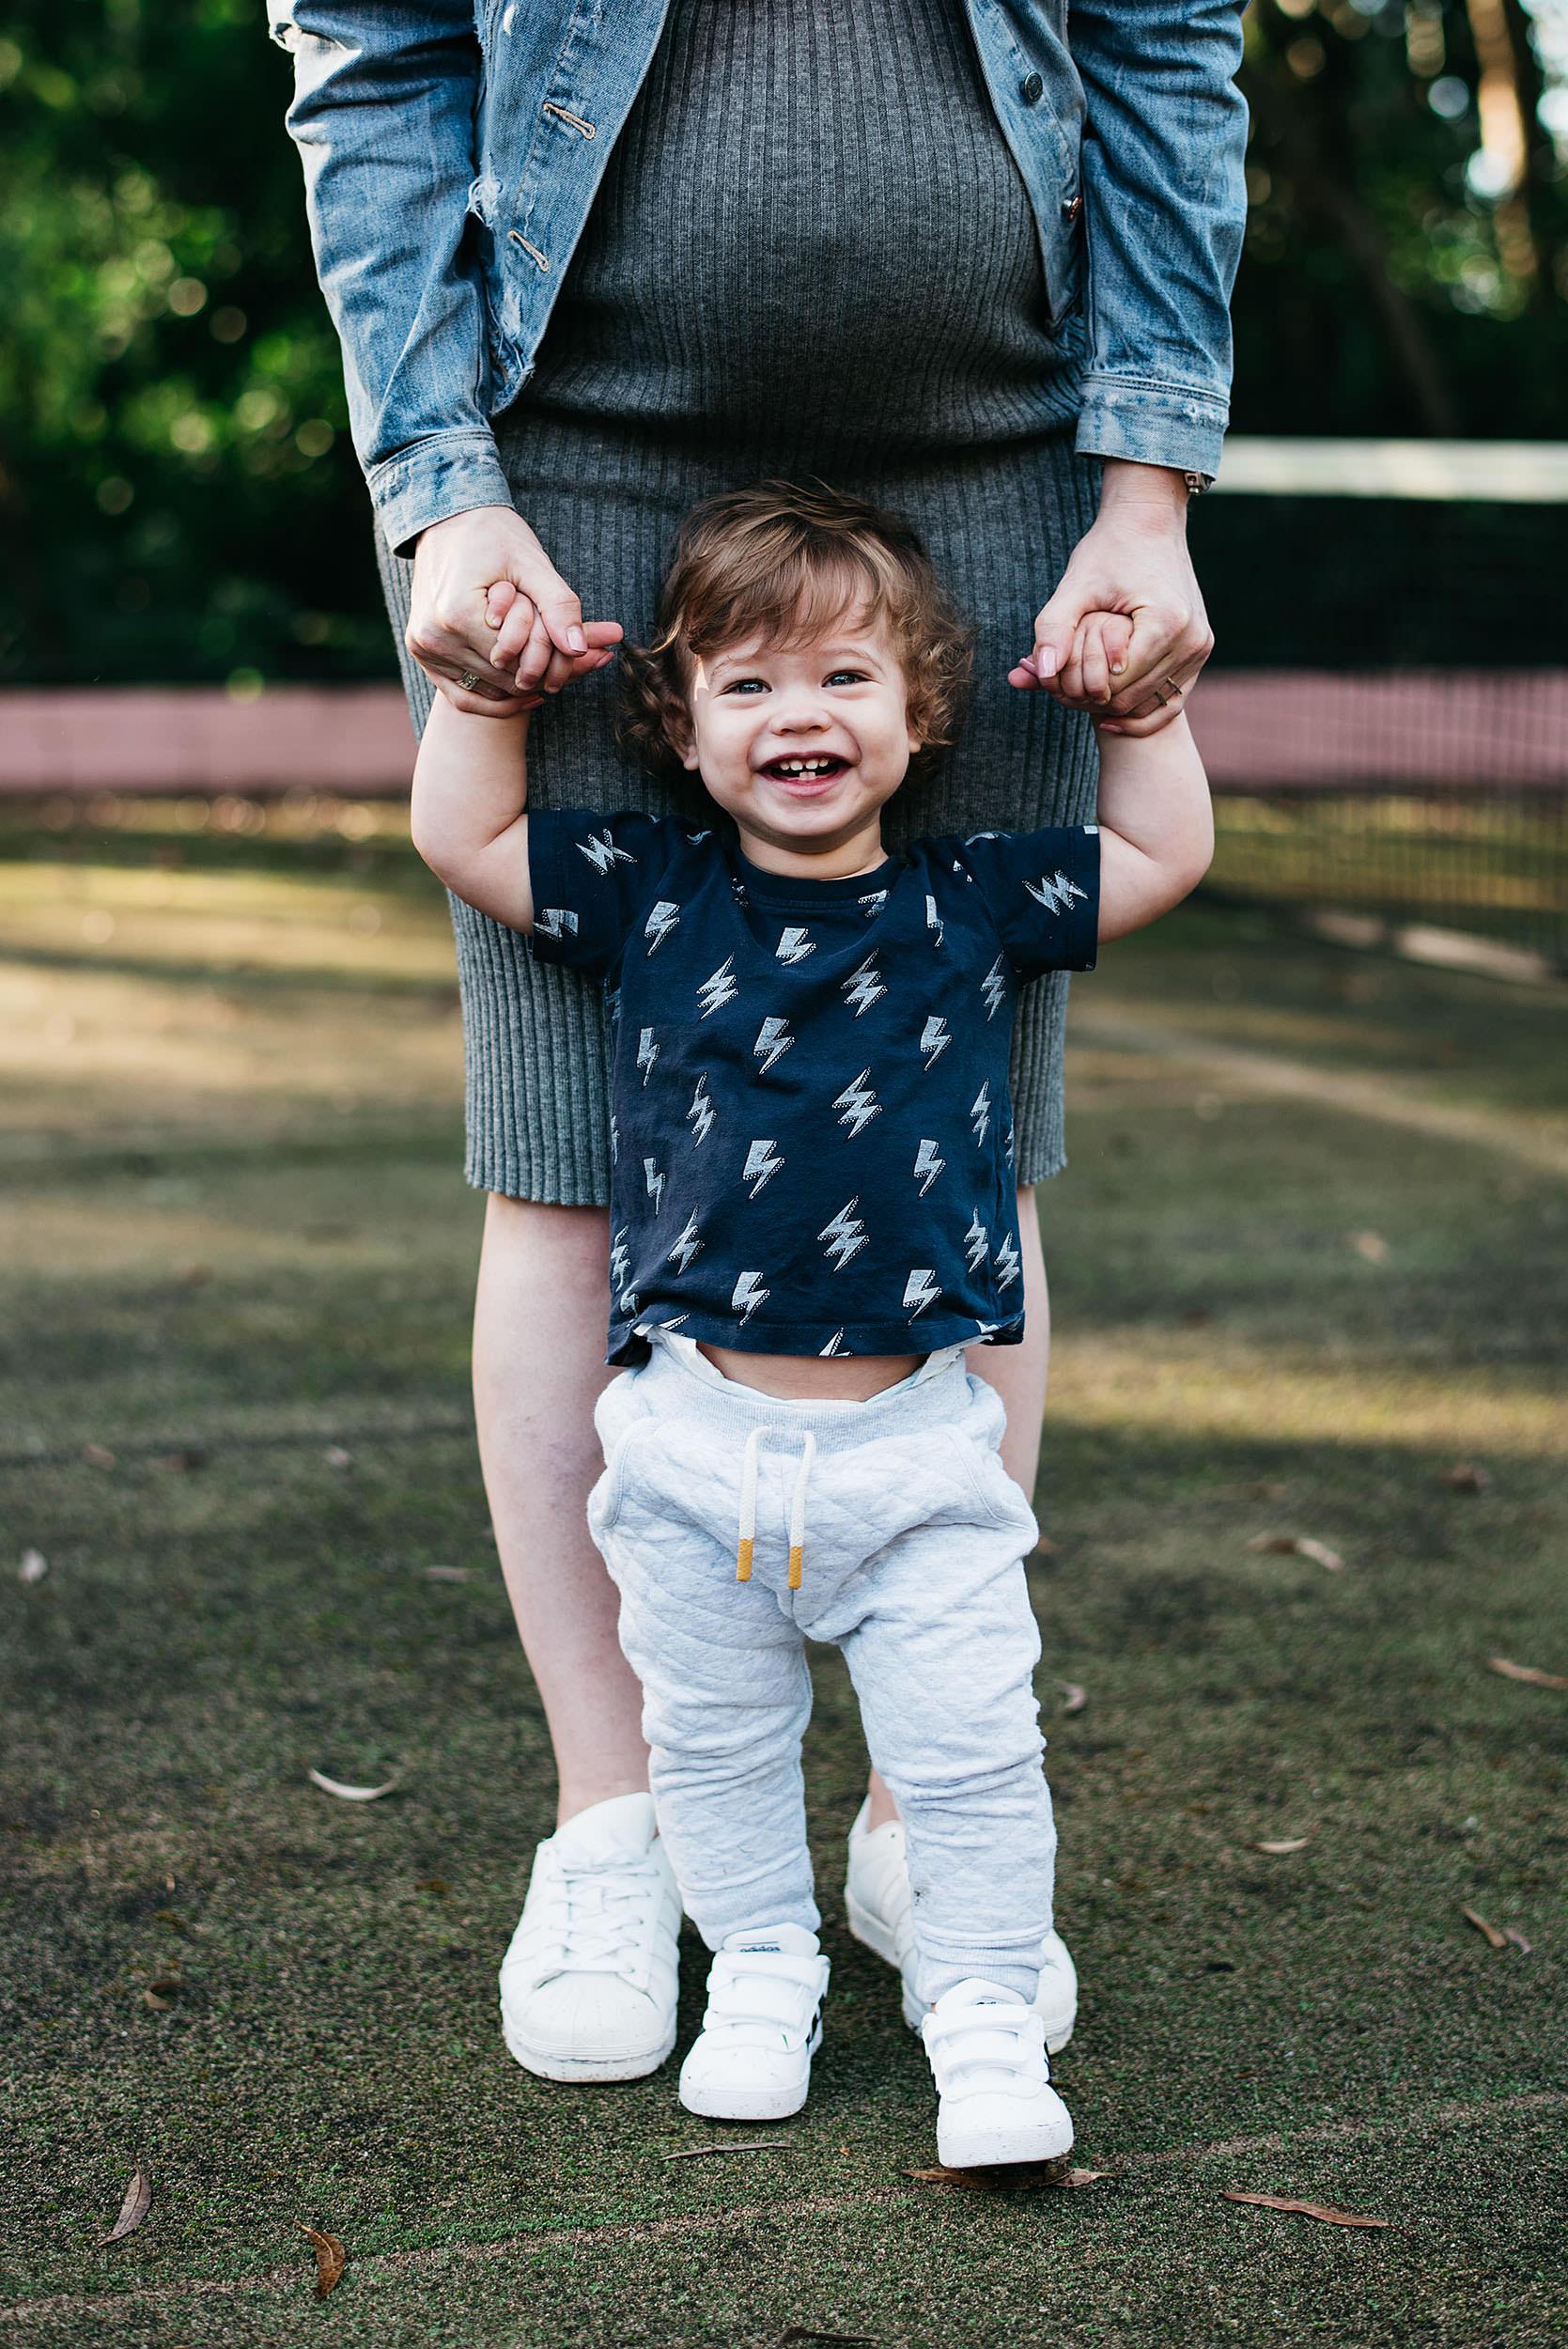 brisbane-family-portrait-photographer-16.jpg